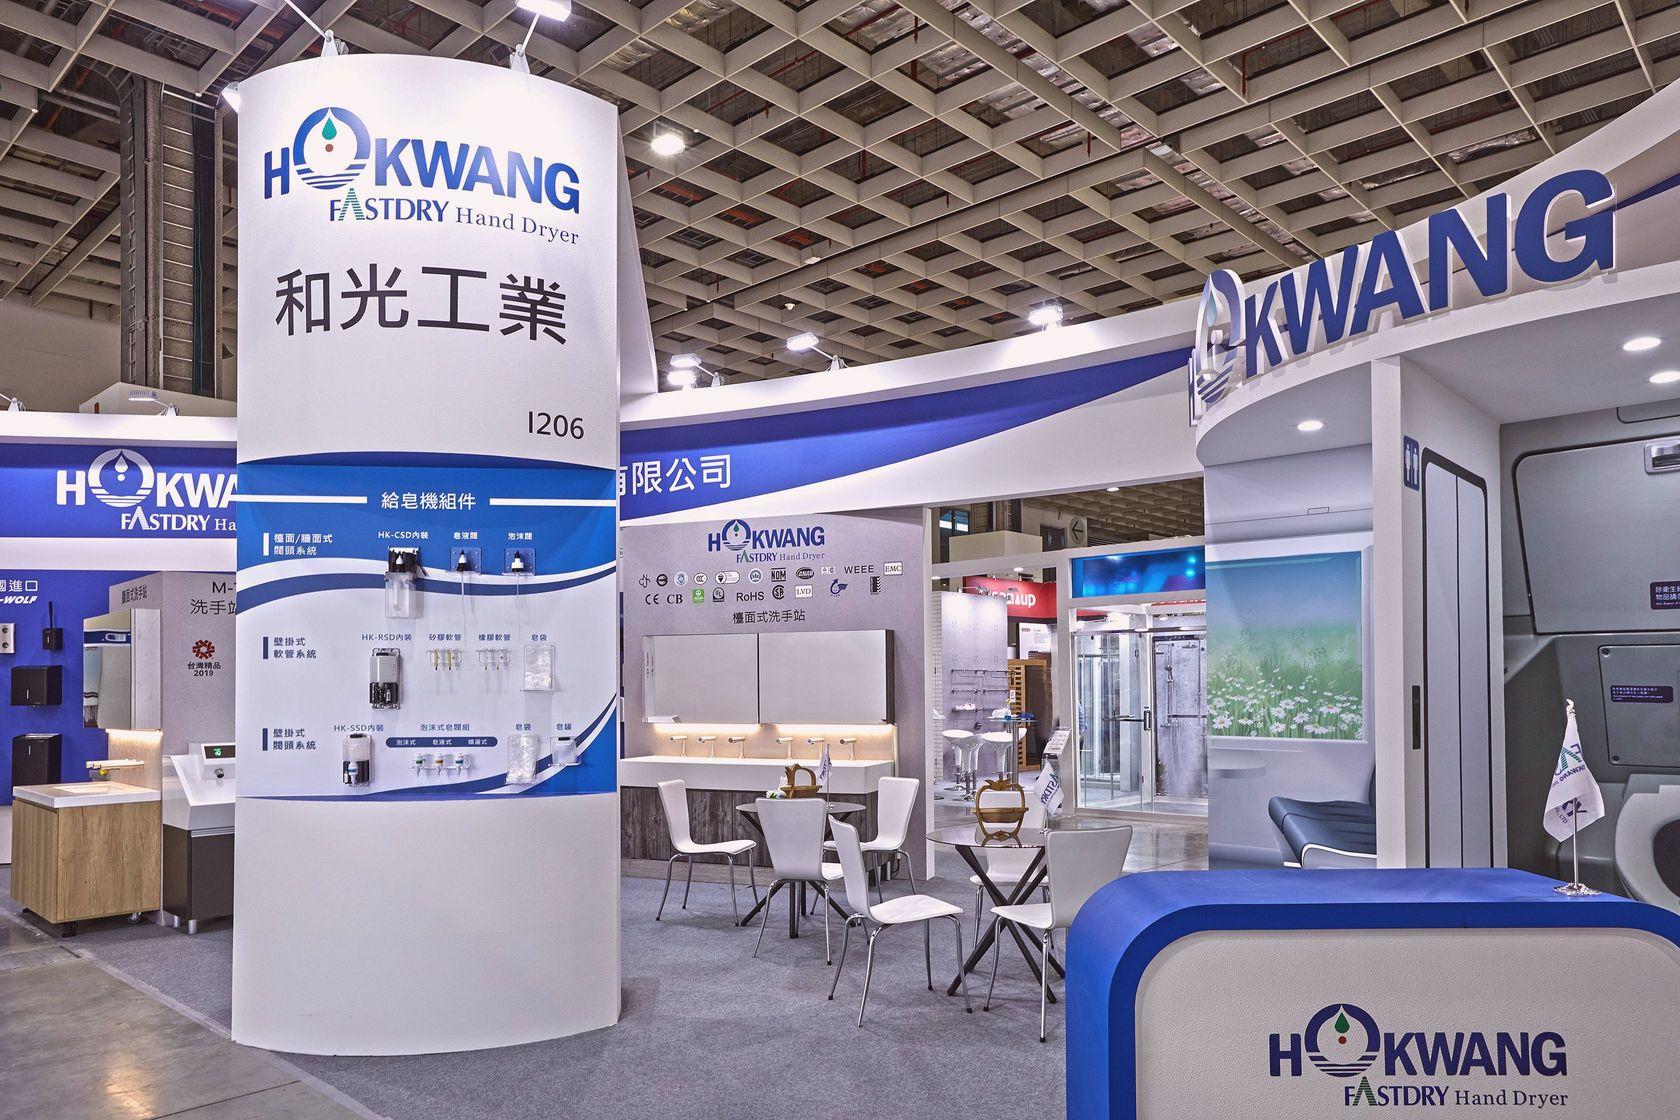 Hokwang ออกแบบบูธในงาน Taipei Building Show 2019